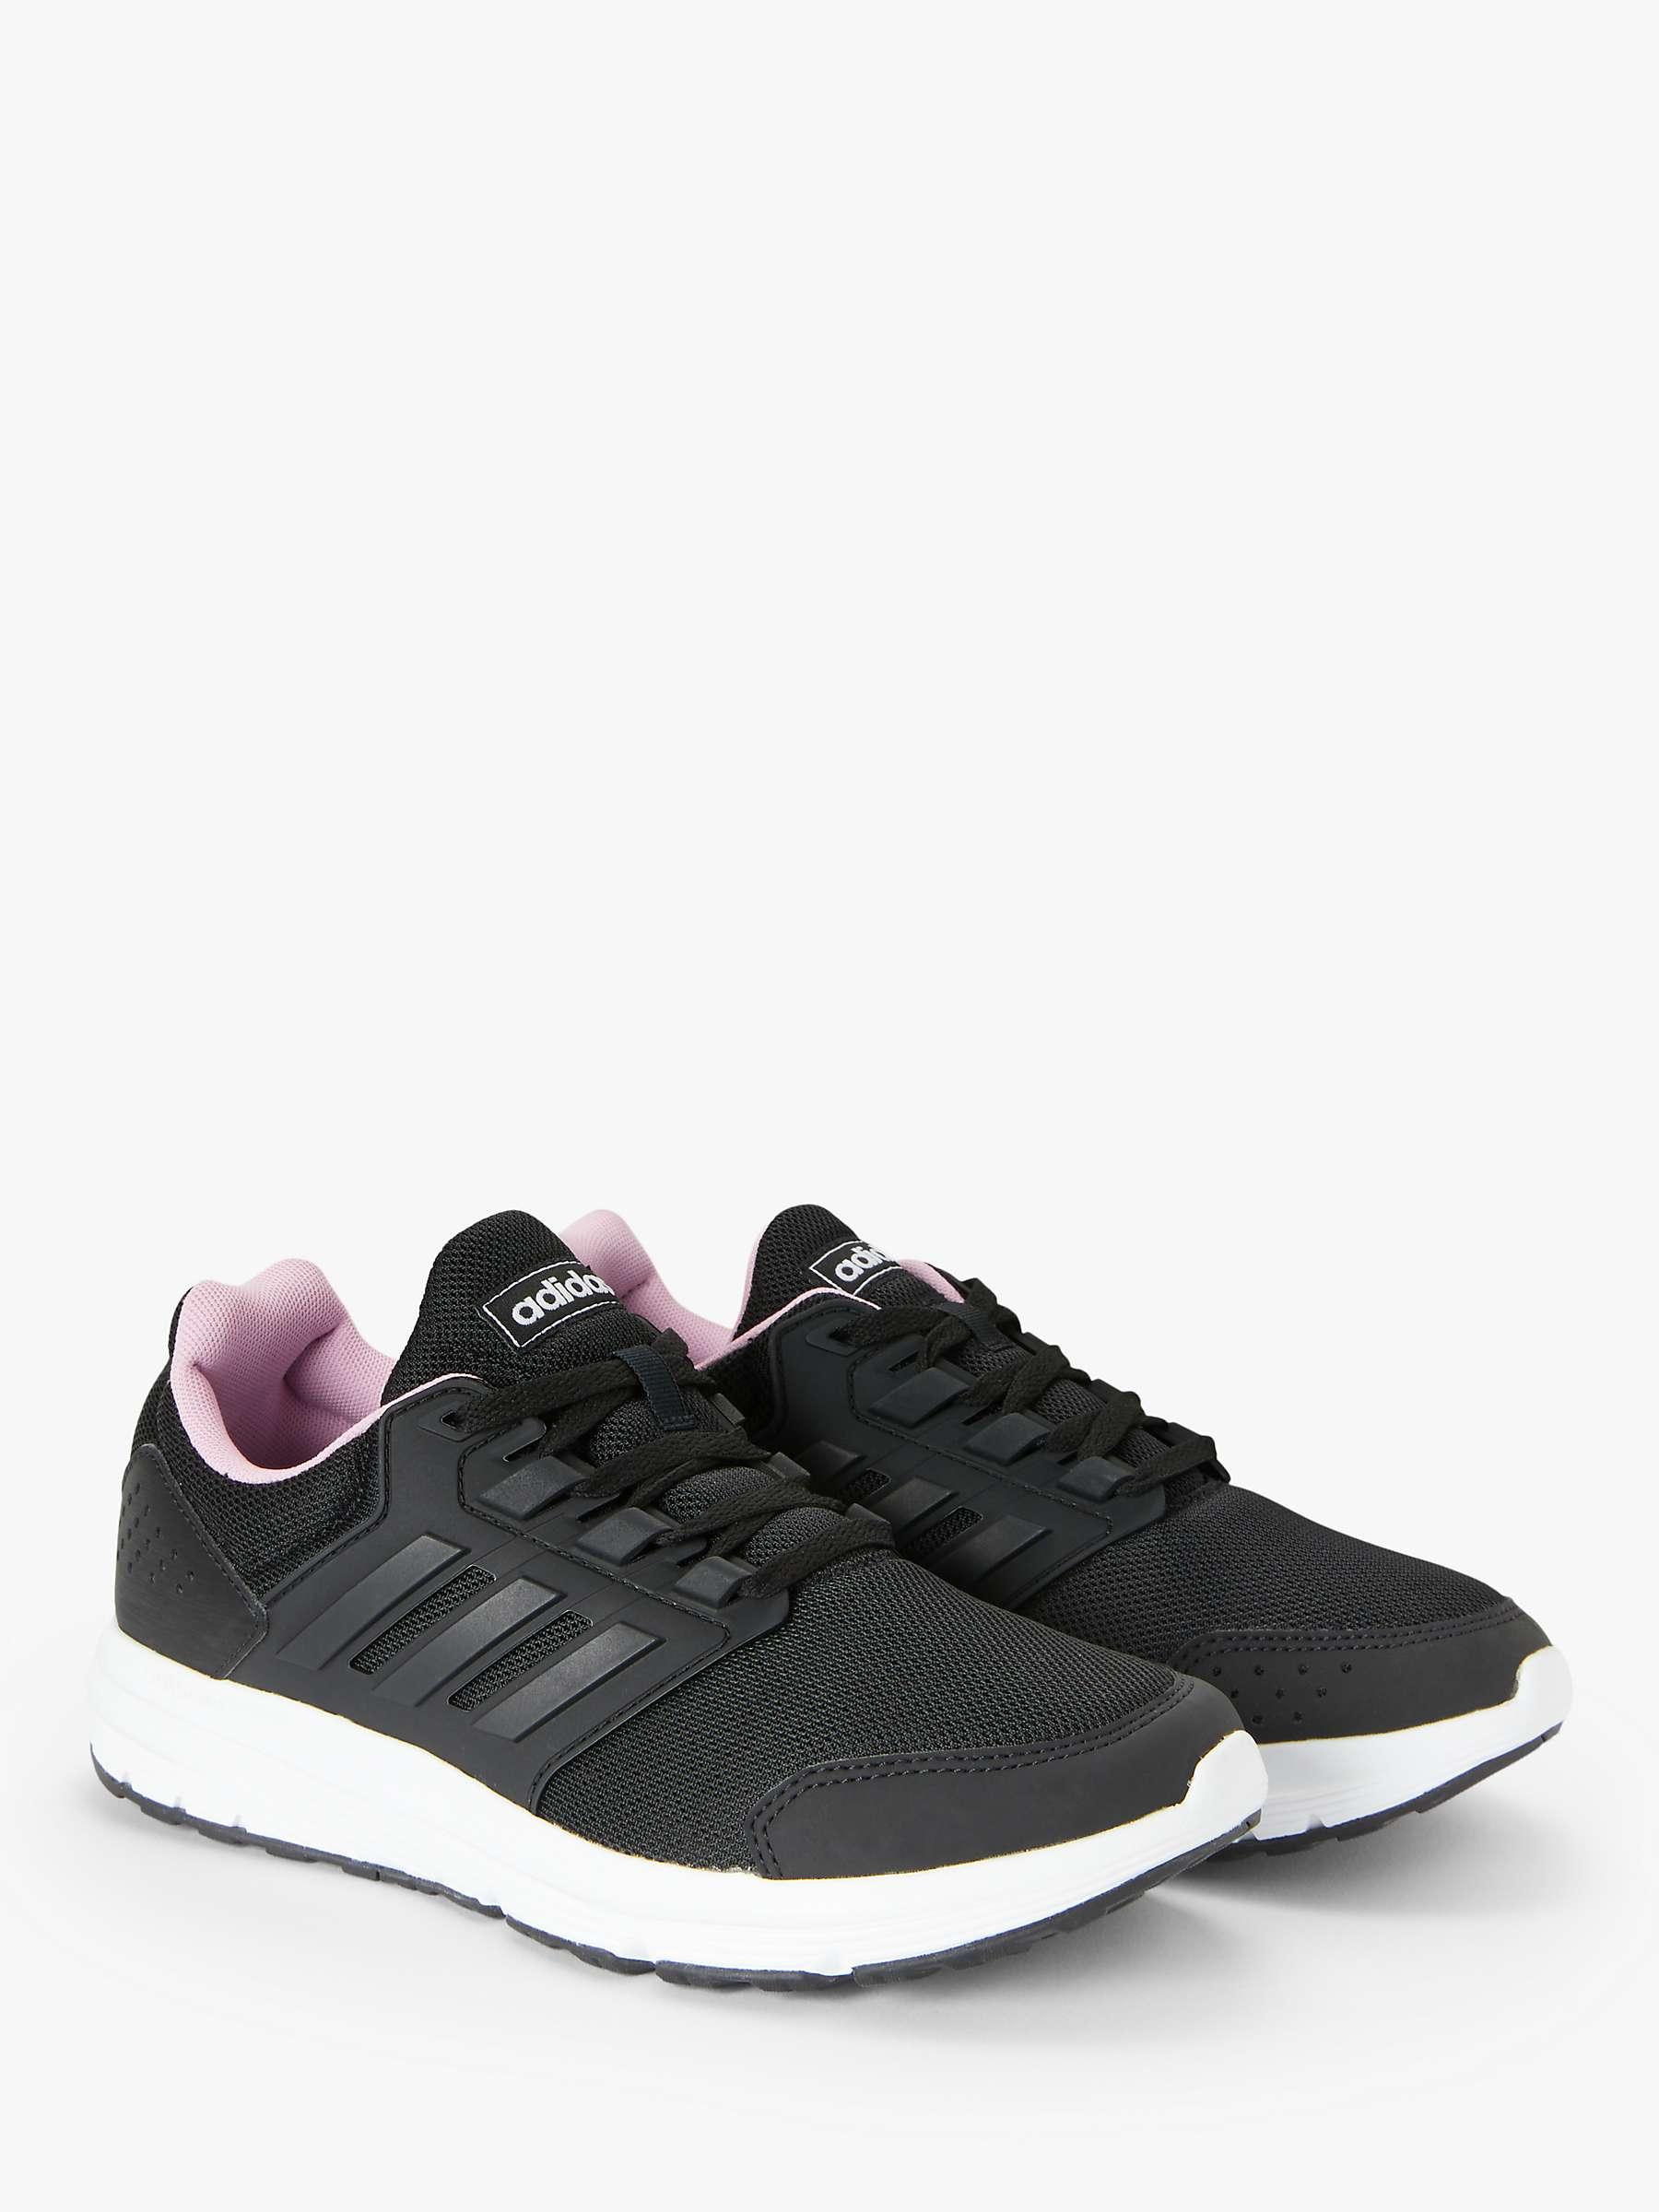 adidas Galaxy 4 Women's Running Shoes